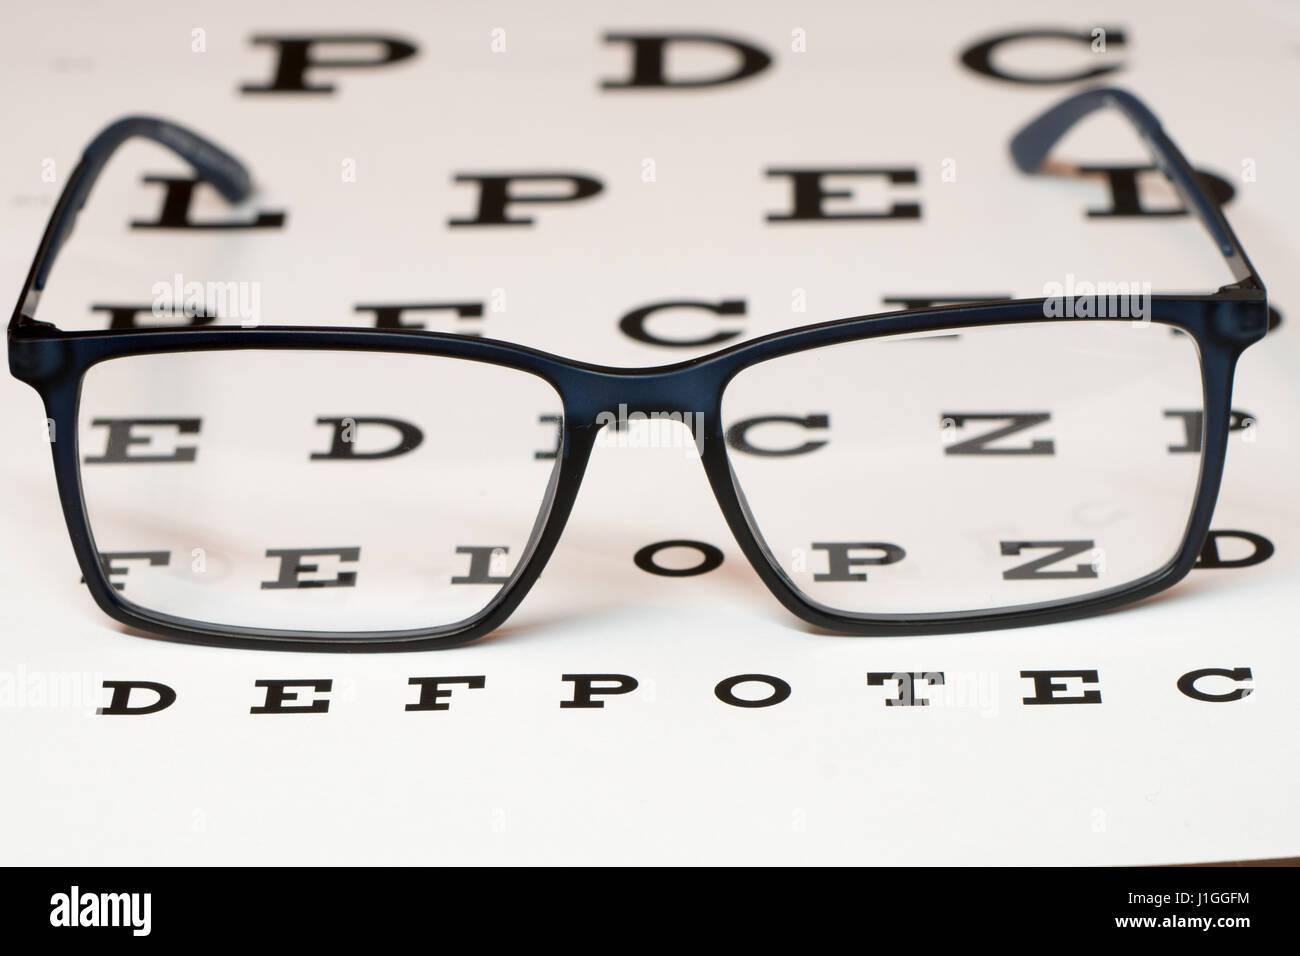 Reading black eyeglasses and eye chart close up stock photo reading black eyeglasses and eye chart close up nvjuhfo Image collections